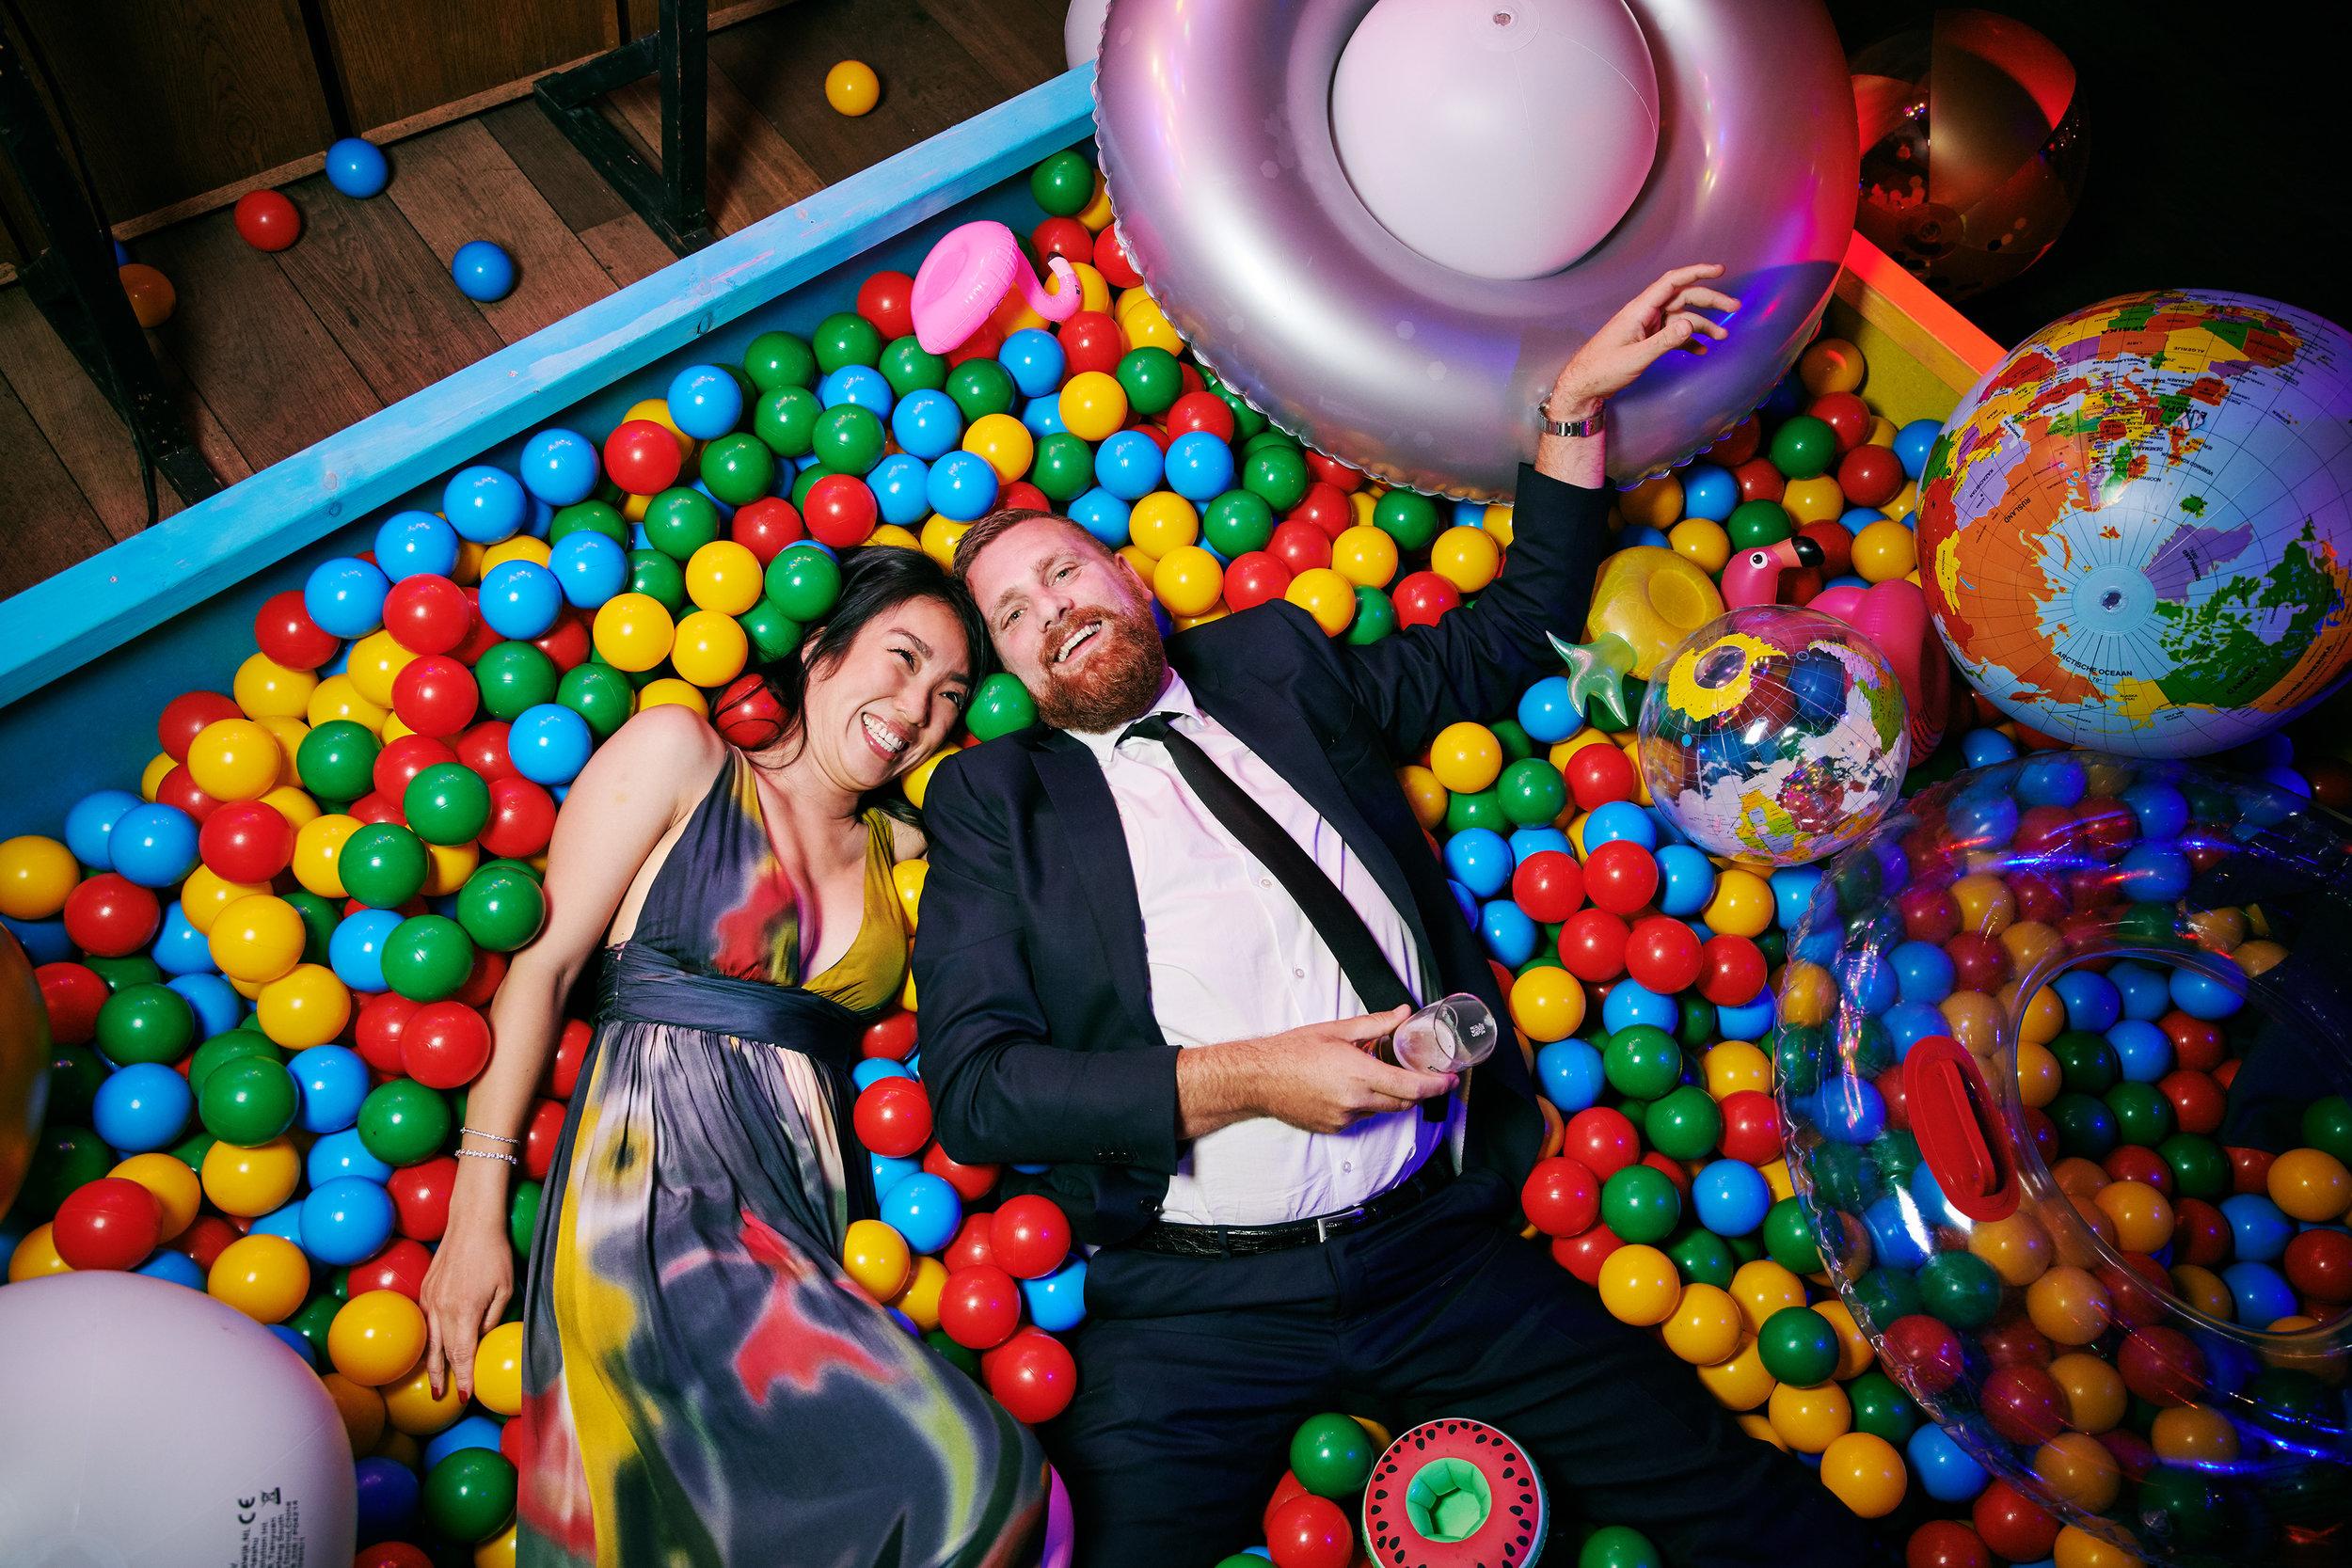 Pien and Rene wedding 18 09 10 by RVDA II 2979.jpg